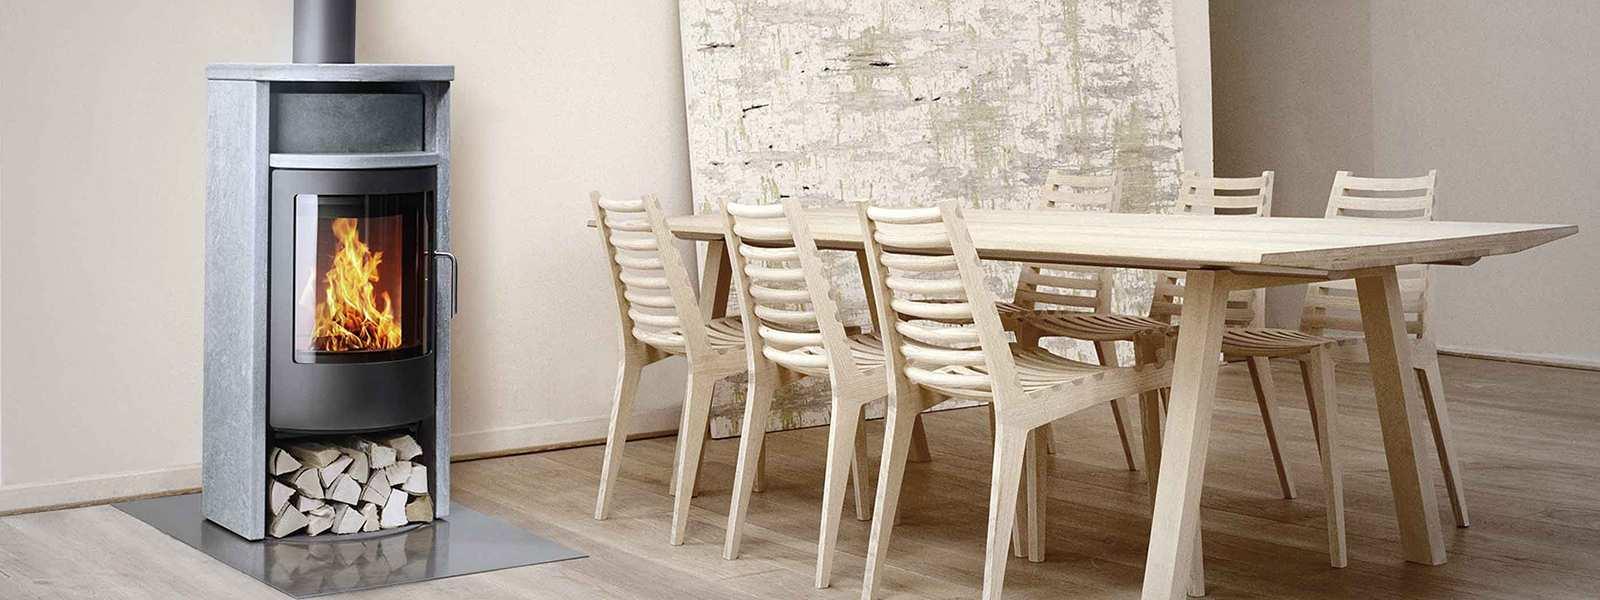 kaminofen bando zeitloses design von attika. Black Bedroom Furniture Sets. Home Design Ideas